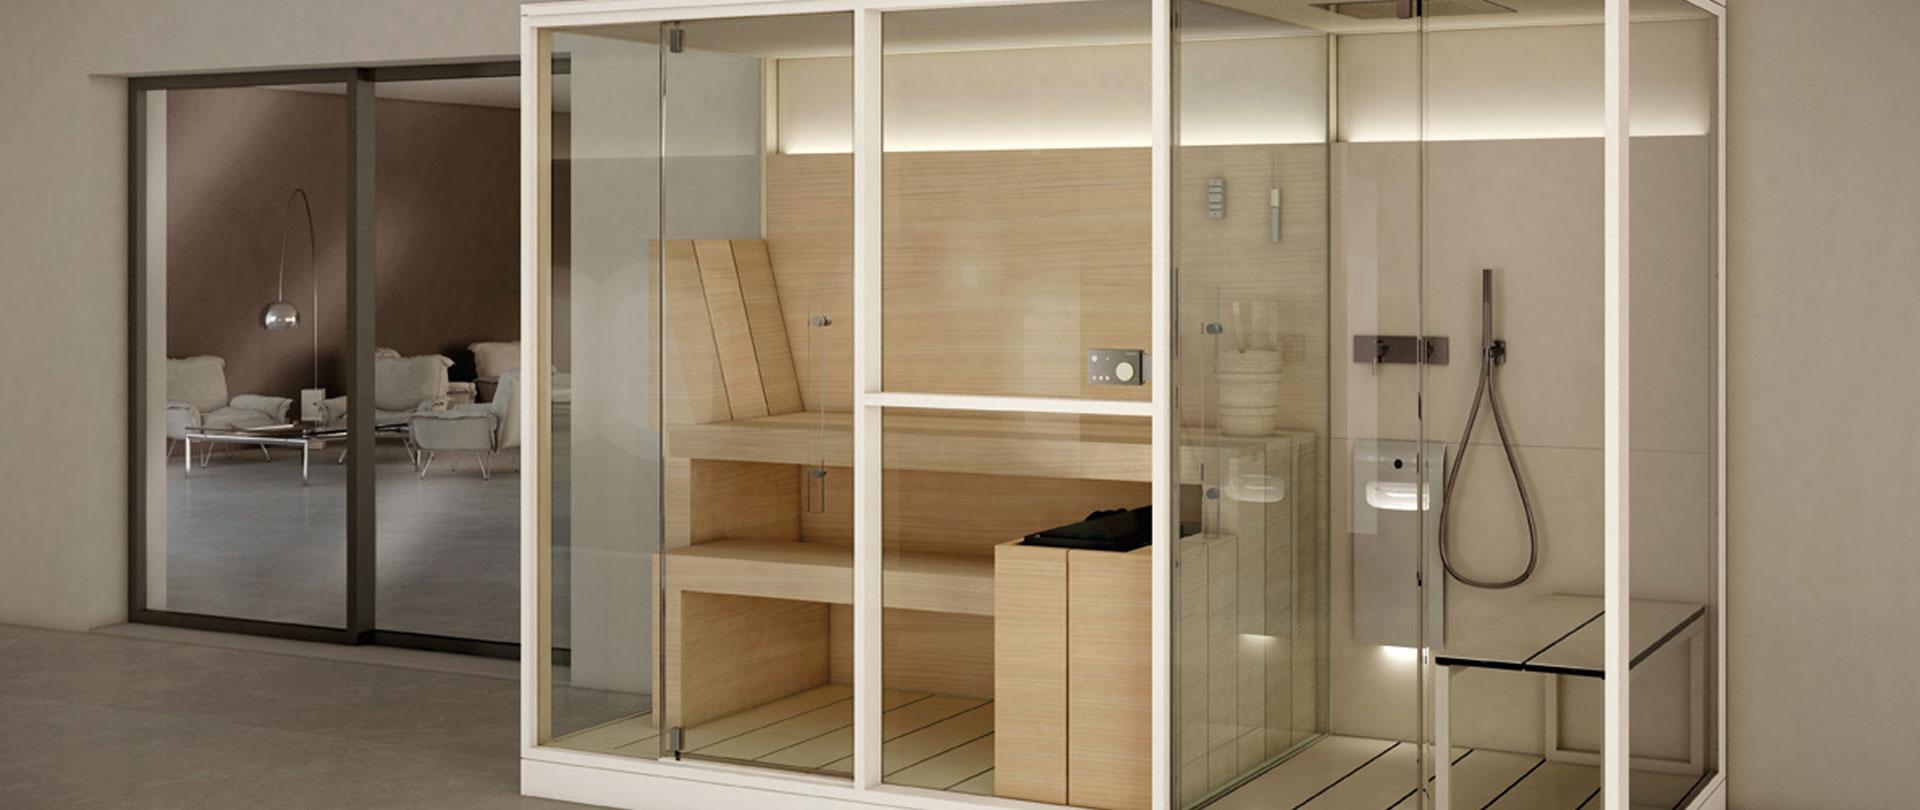 Hammam douche sur mesure annecy atelier nordic - Combine sauna hammam ...